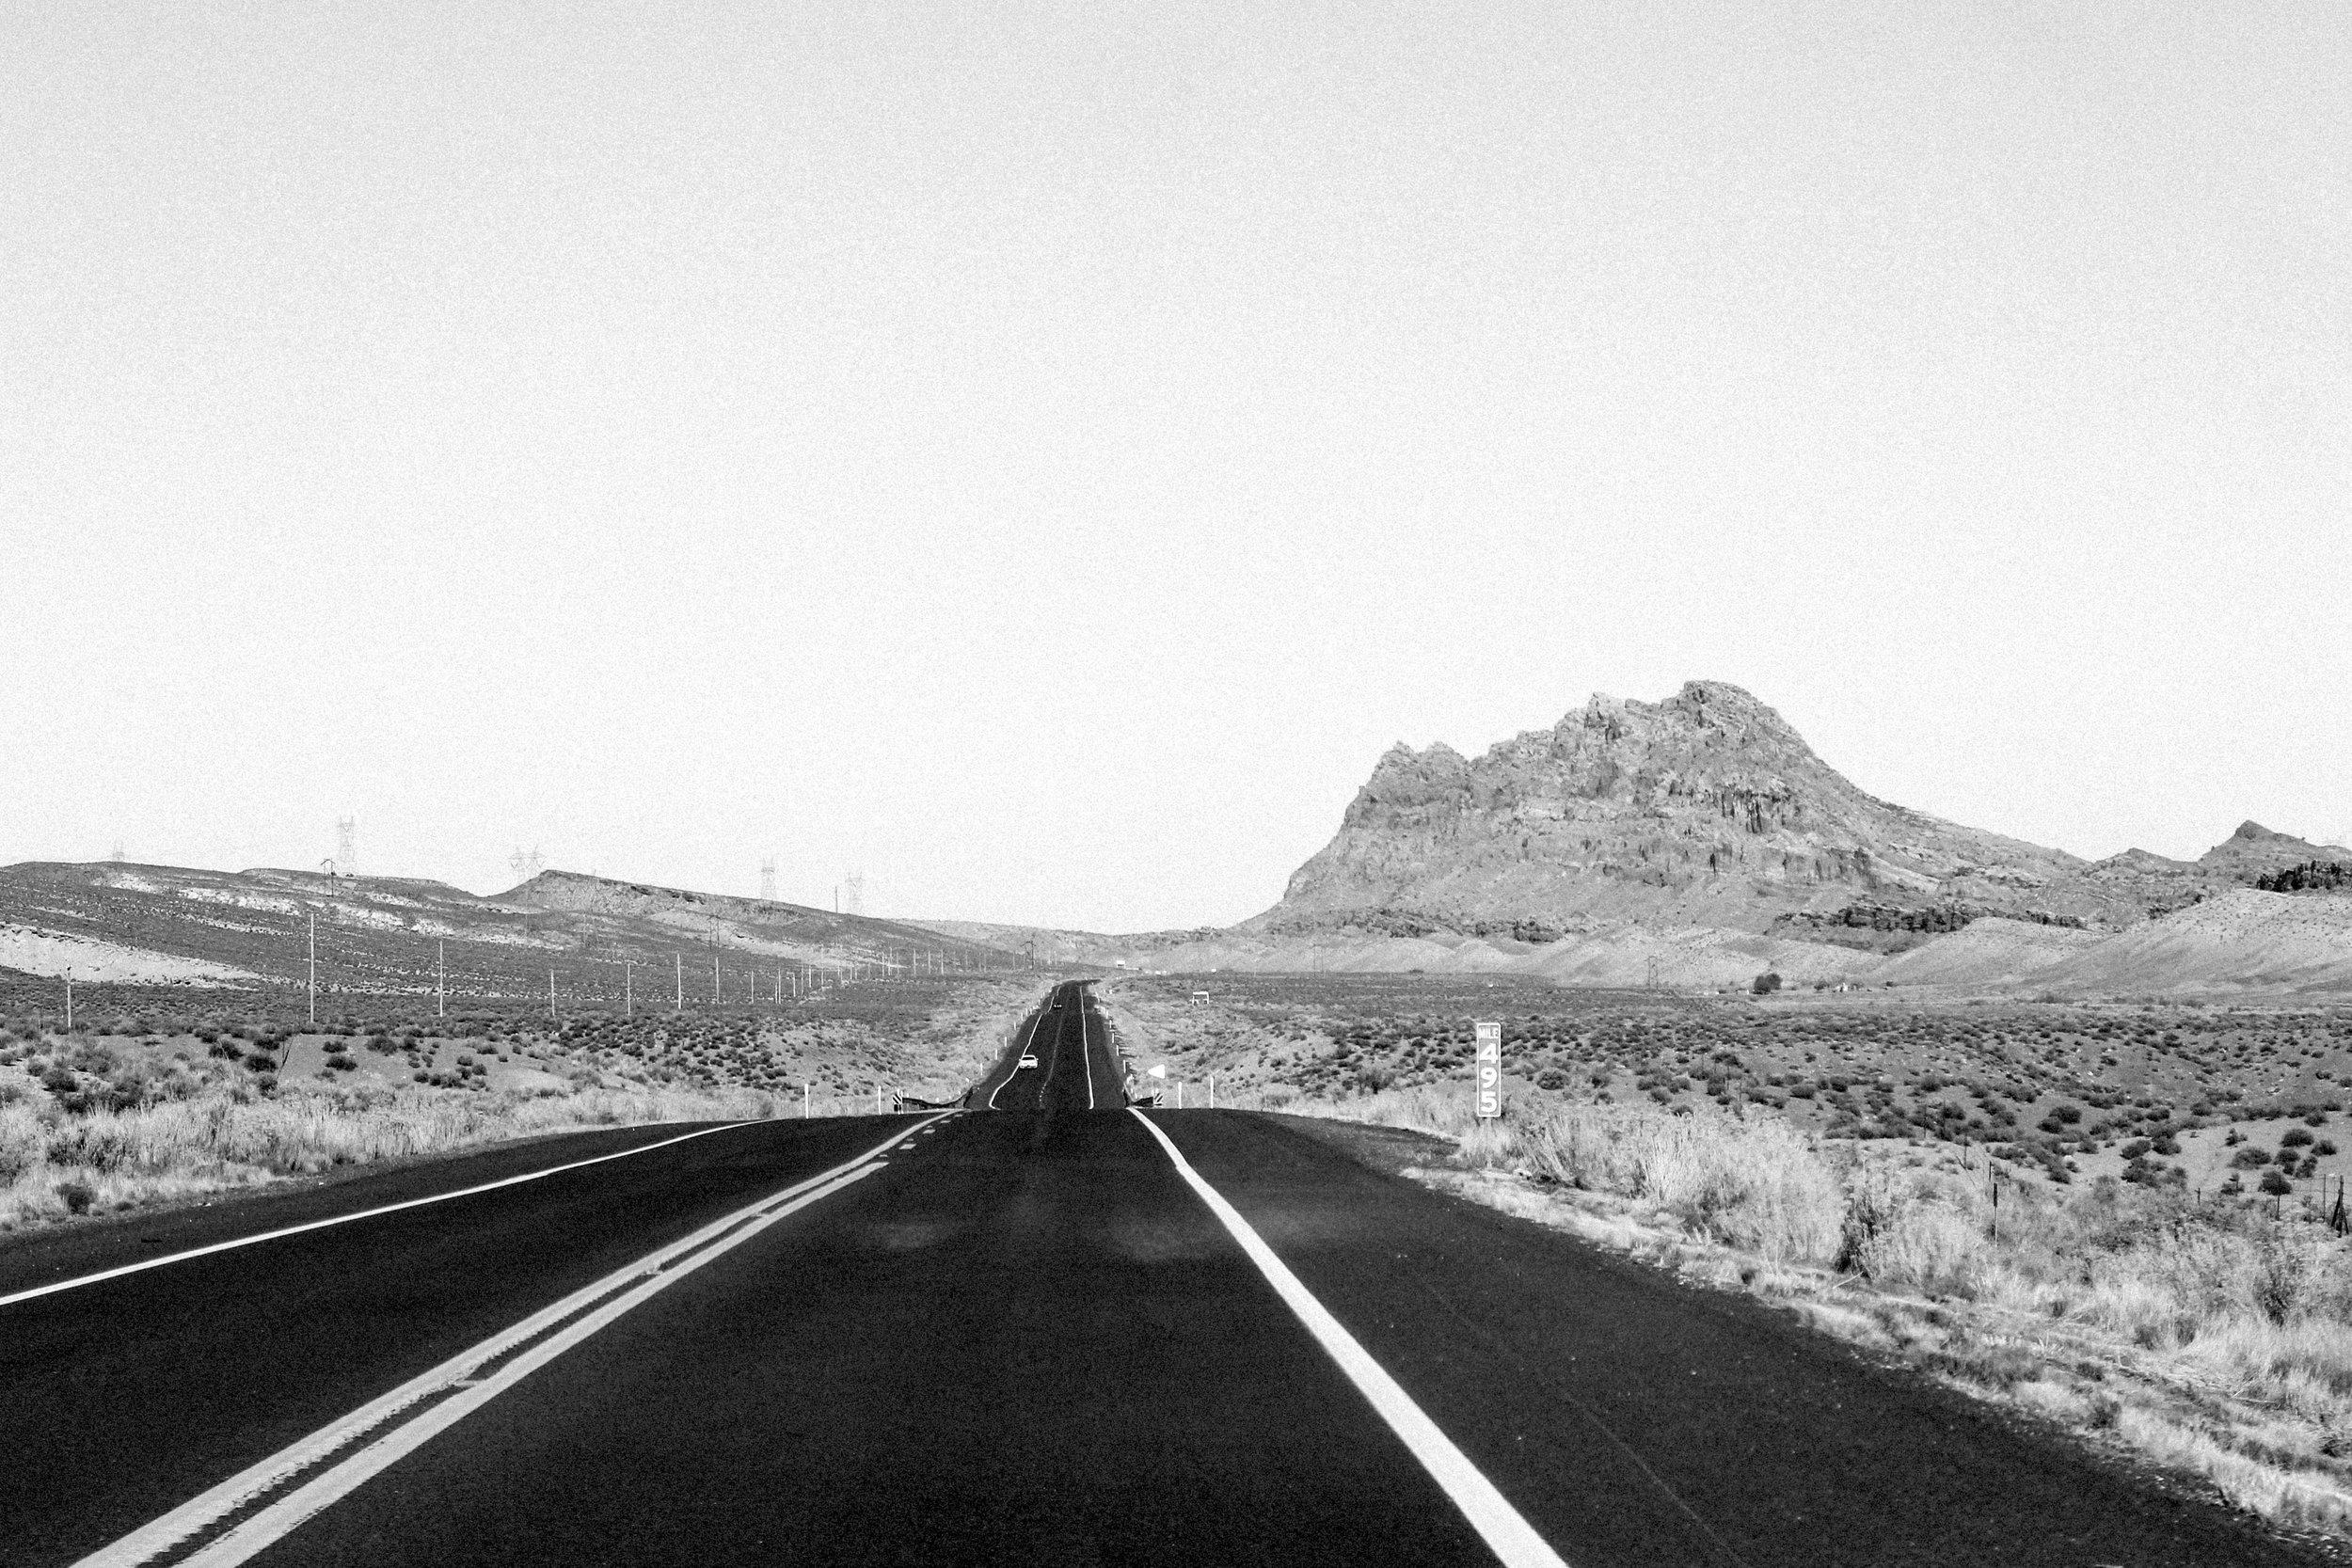 American Road Trip 002 - taylorkristiina.com - taylor ifland photography